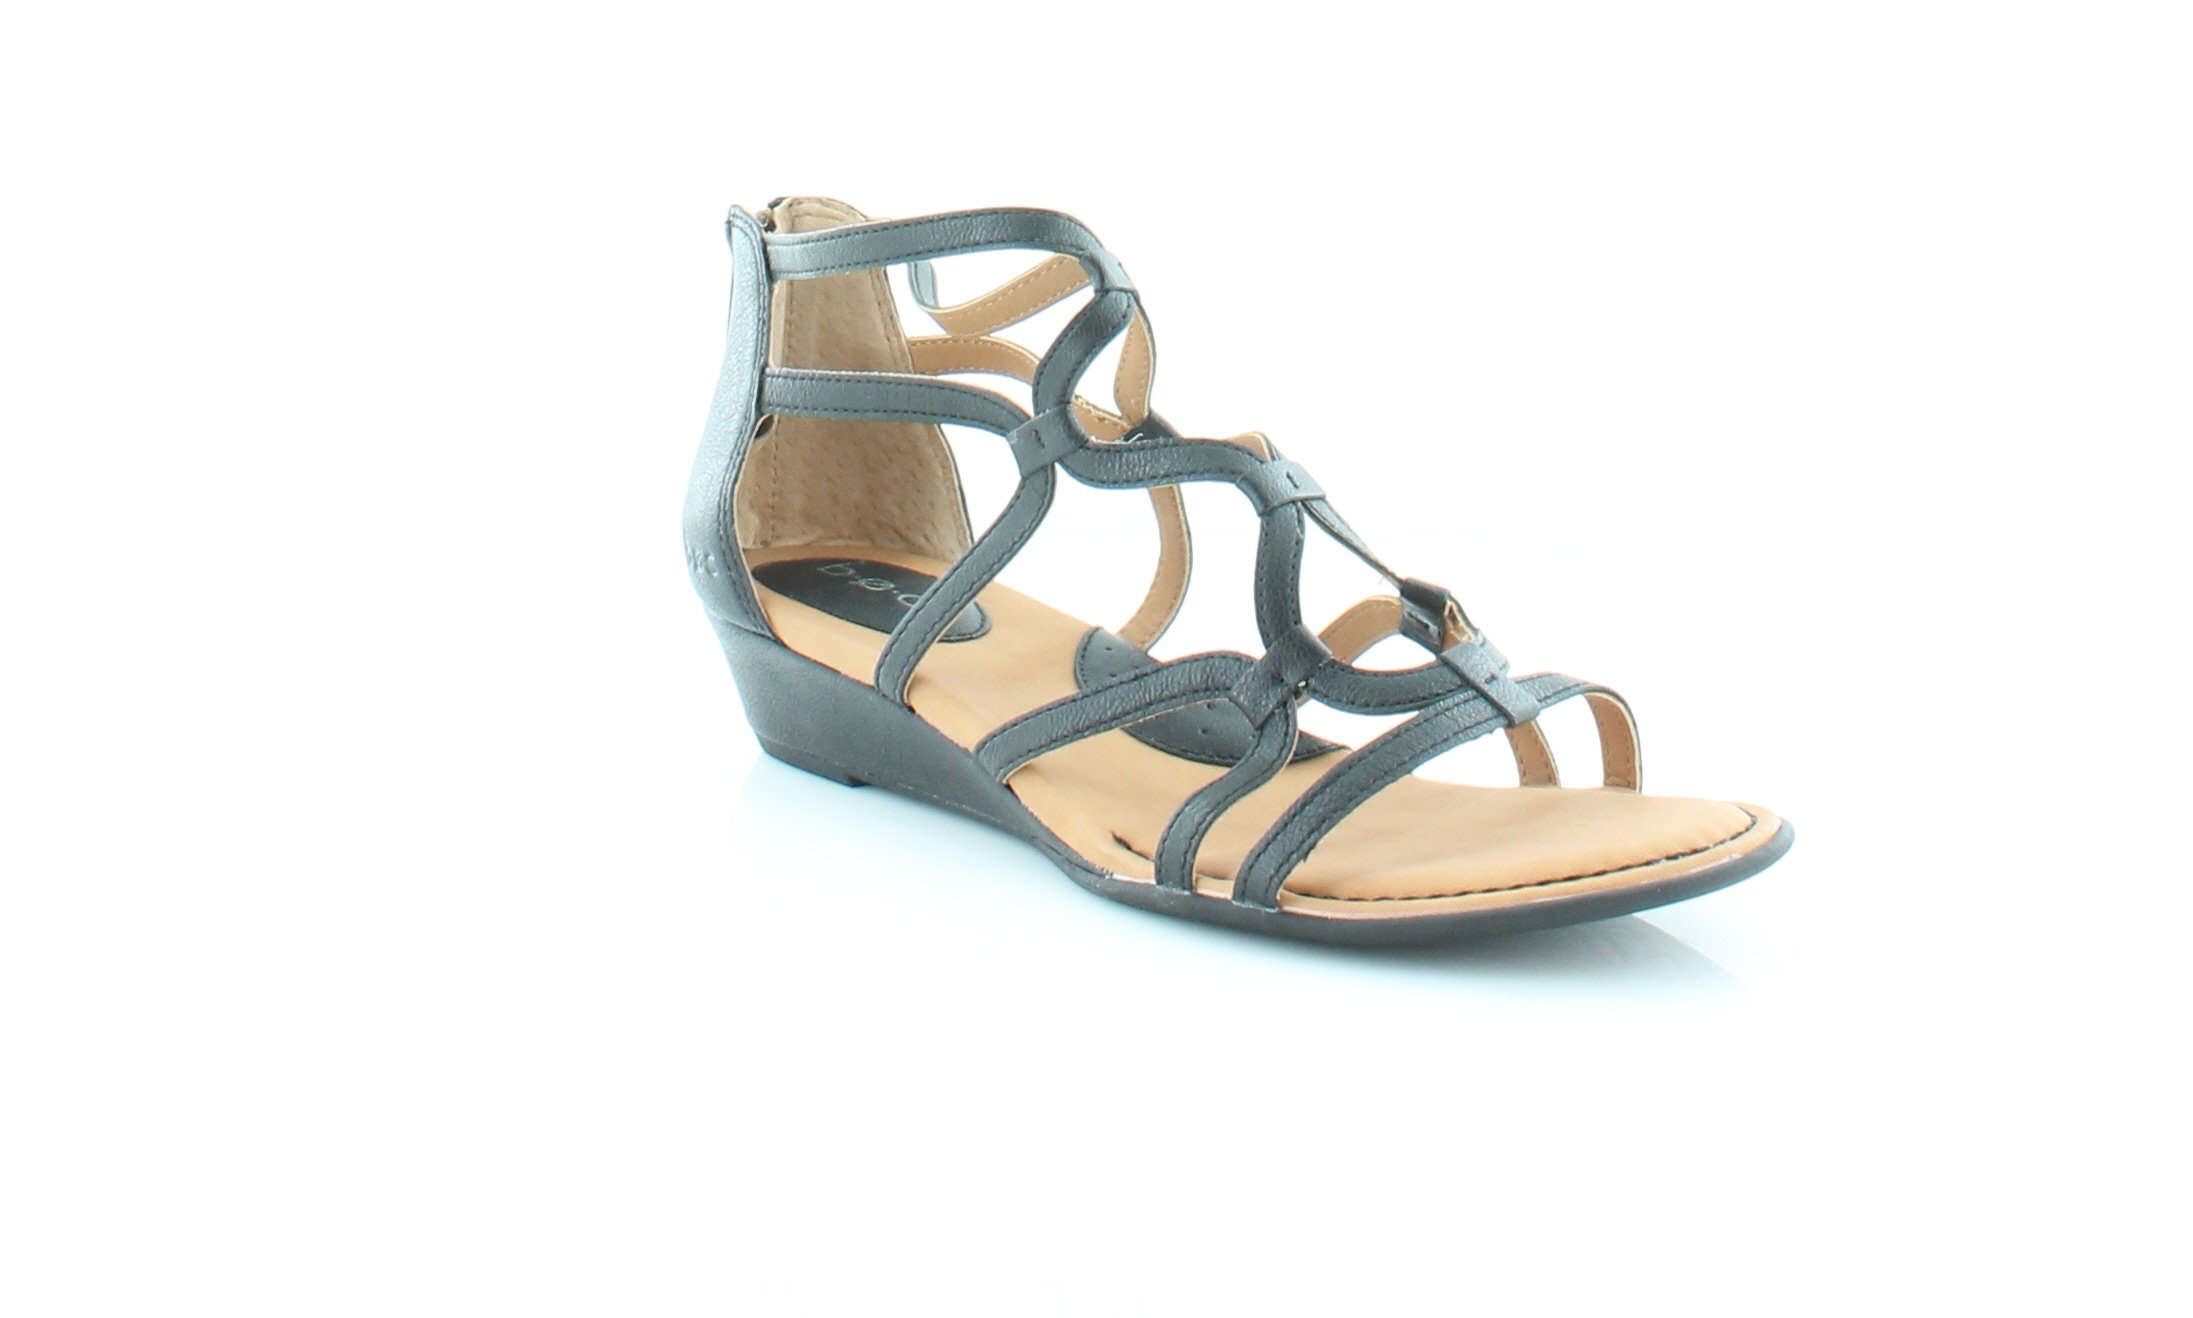 B.O.C. Womens Pawel Open Toe Casual Gladiator Sandals, Black, Size 8.0